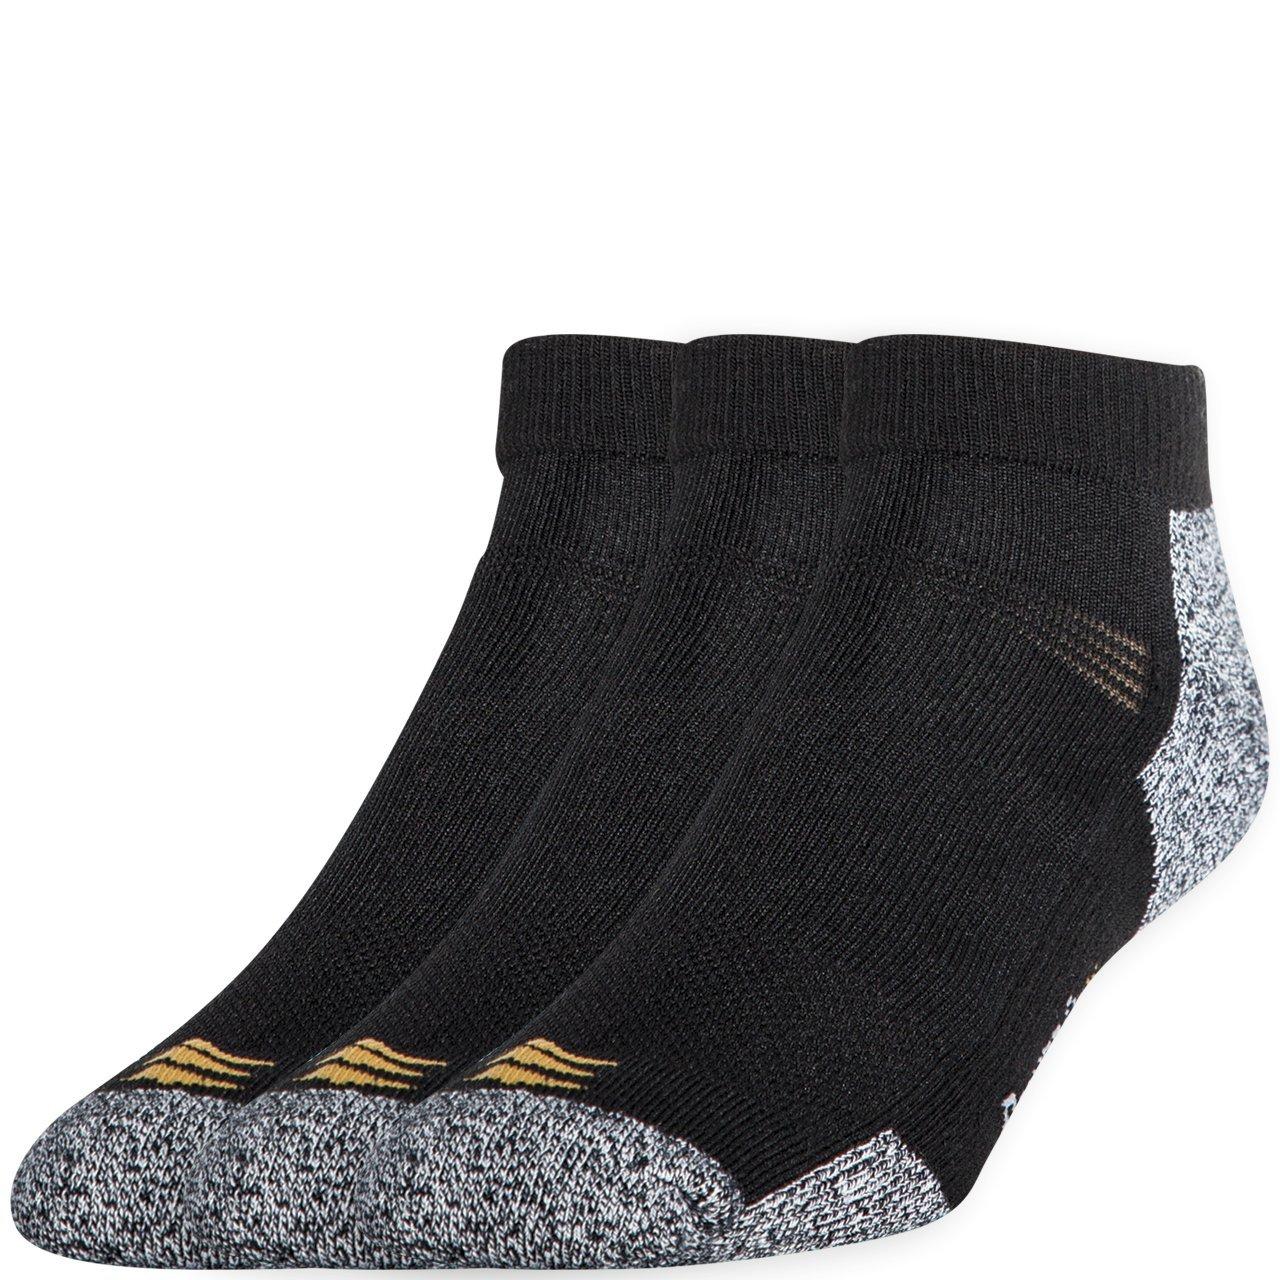 PowerSox Men's Powerlites 3-Pack Low Cut Socks with Moisture Control Black 10-13(9-12.5 shoe size)